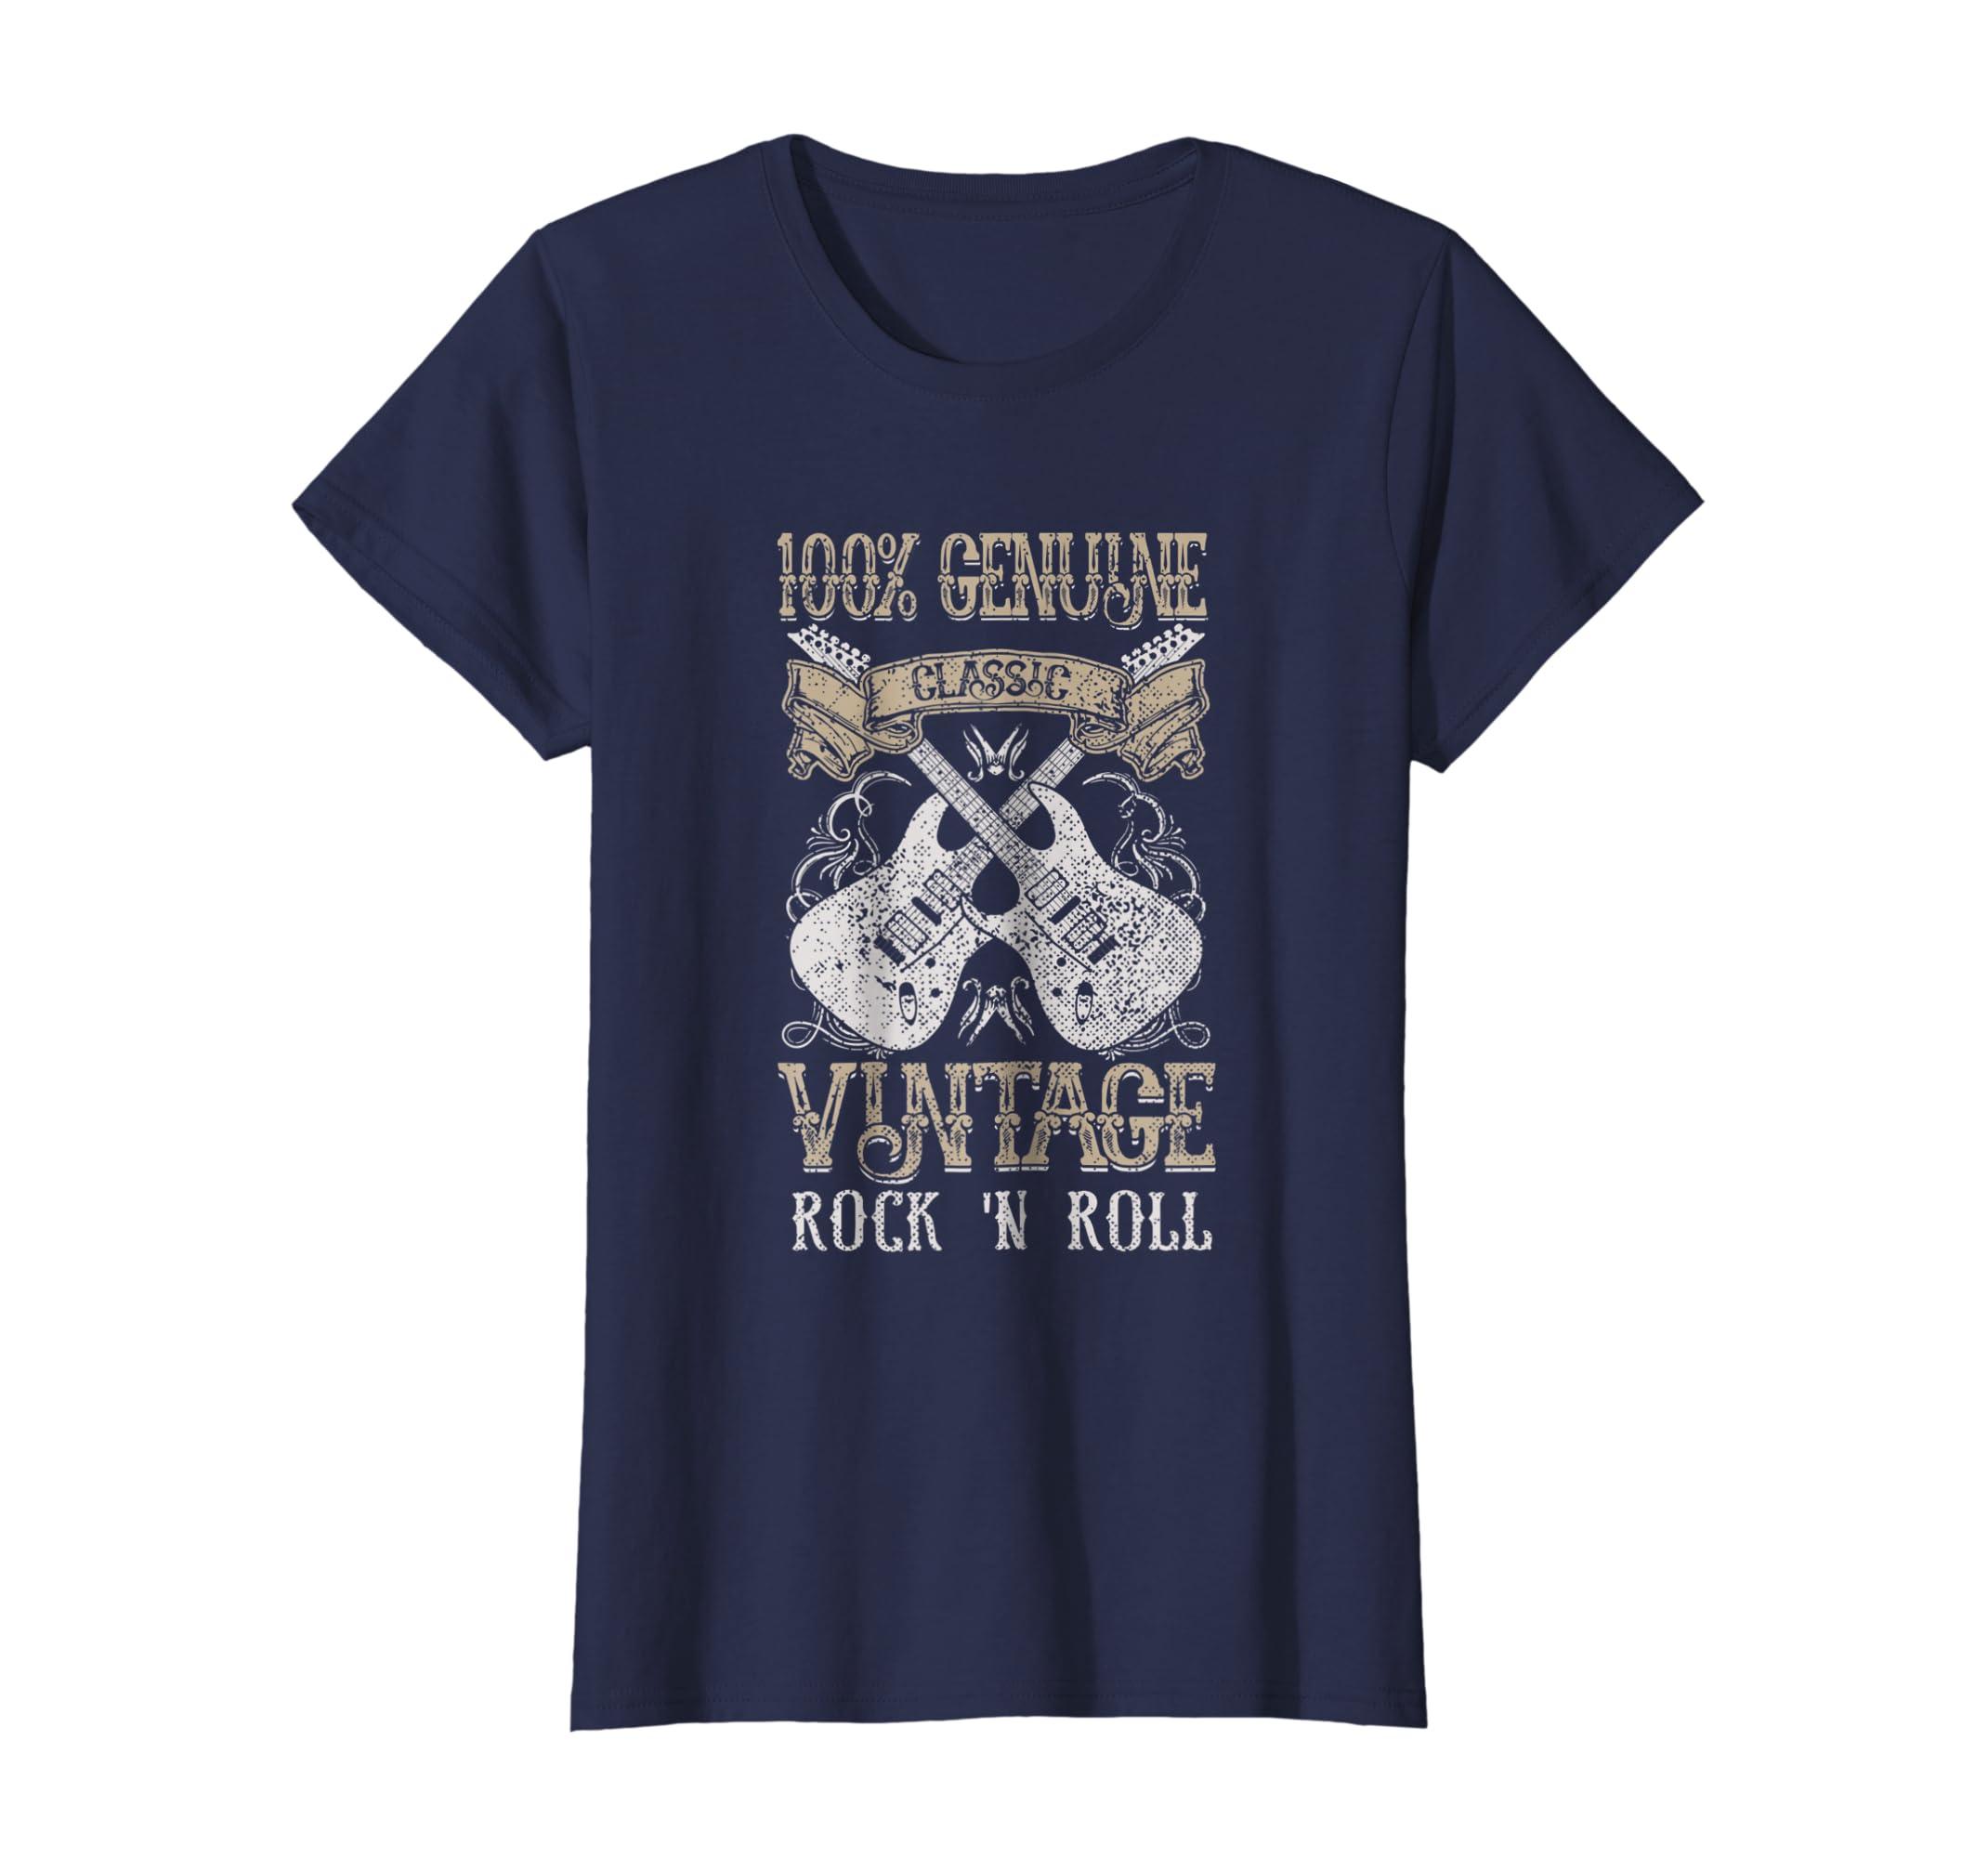 9c144c93 Amazon.com: Classic Vintage Rock T Shirt Rock n Roll Guitars Music Gift:  Clothing